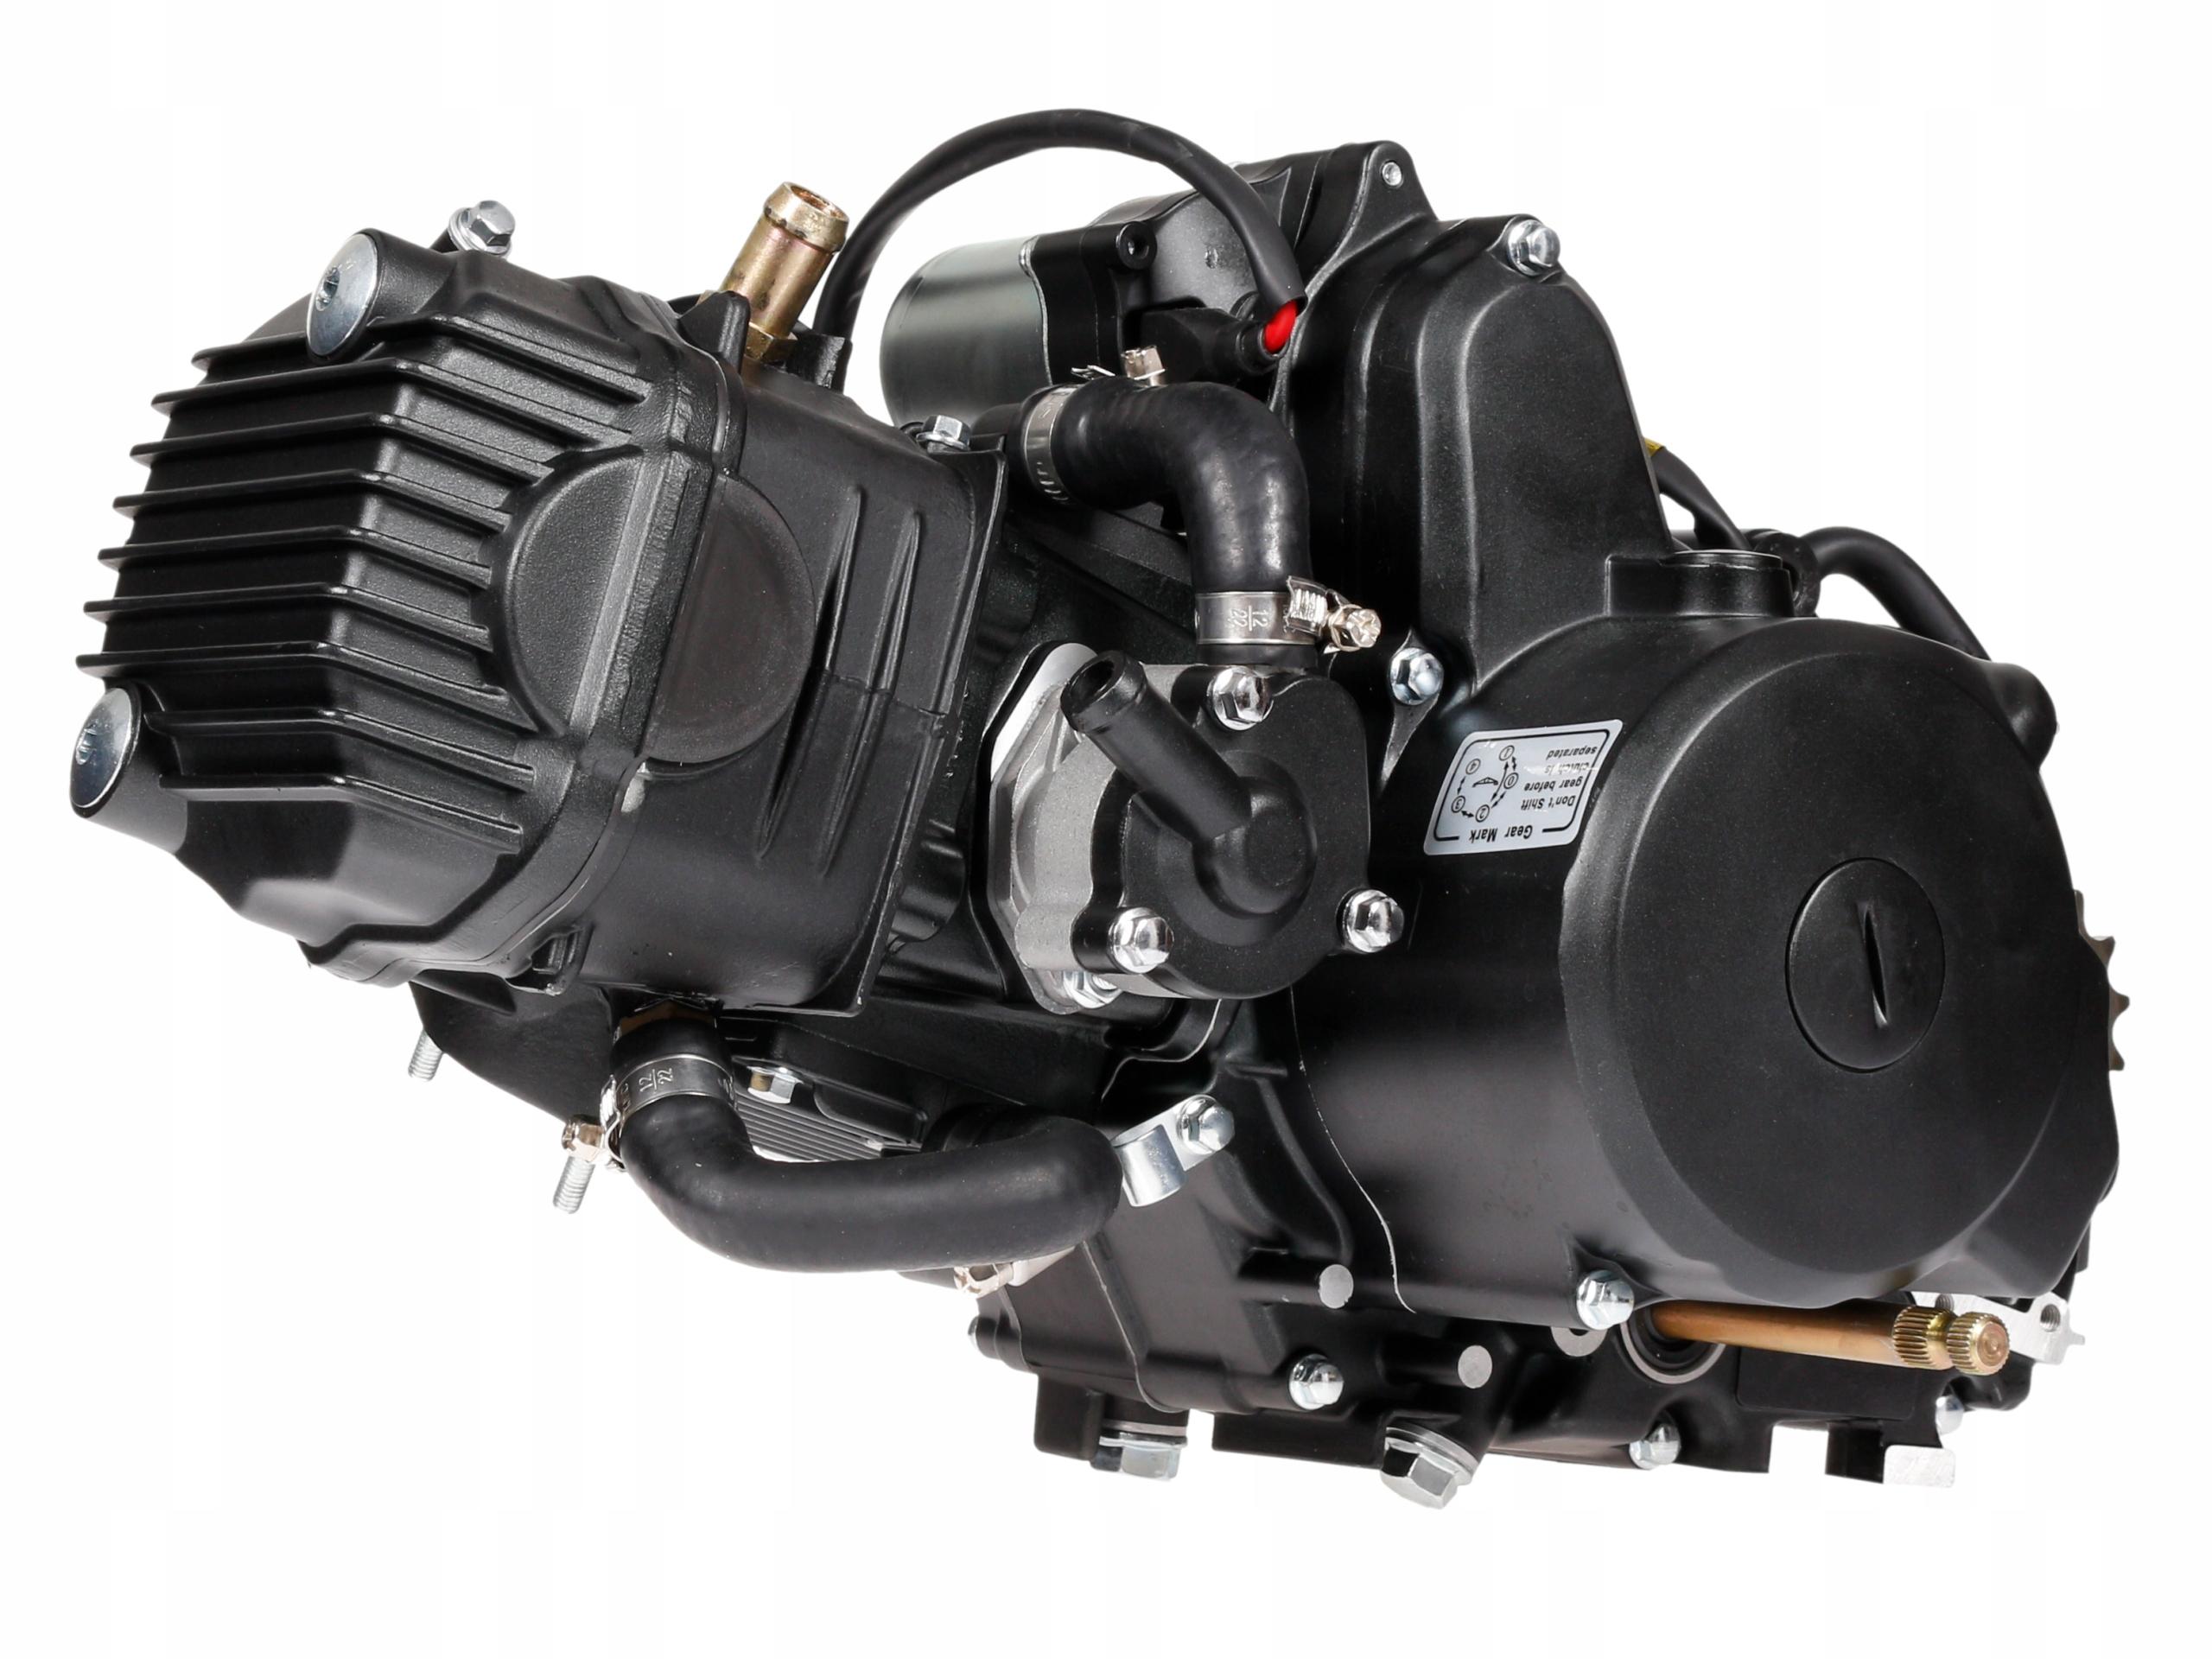 Двигатель 130см Moretti 4T ЖИДКОСТЬ Юноша Romet Barton